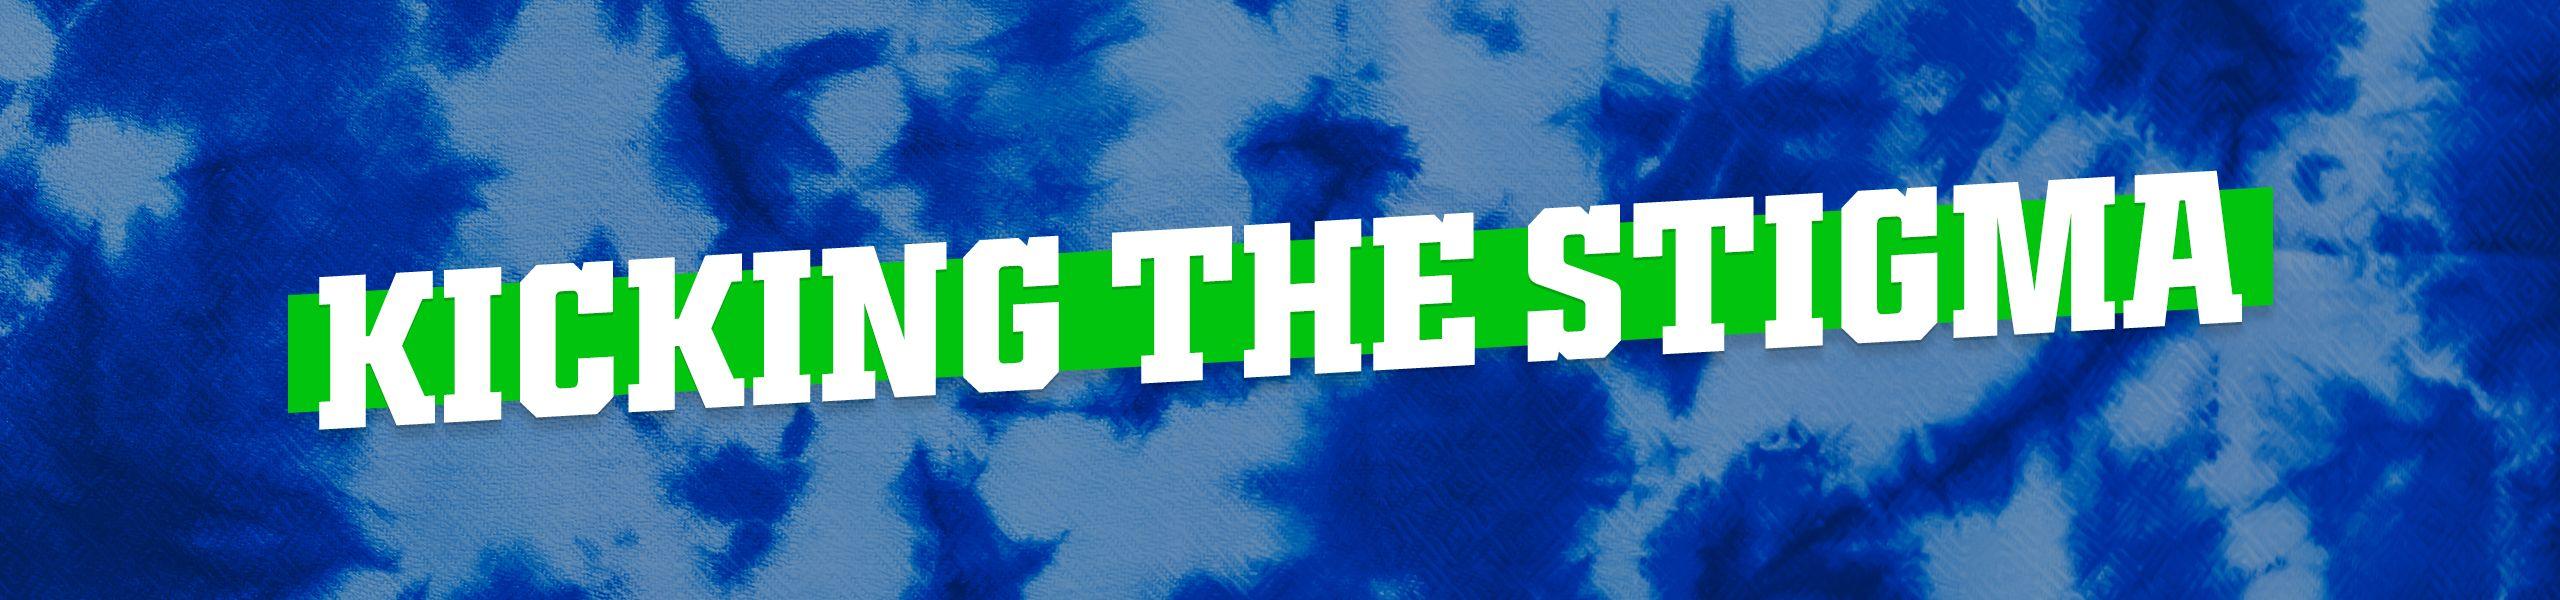 Colts Kicking The Stigma Initiative